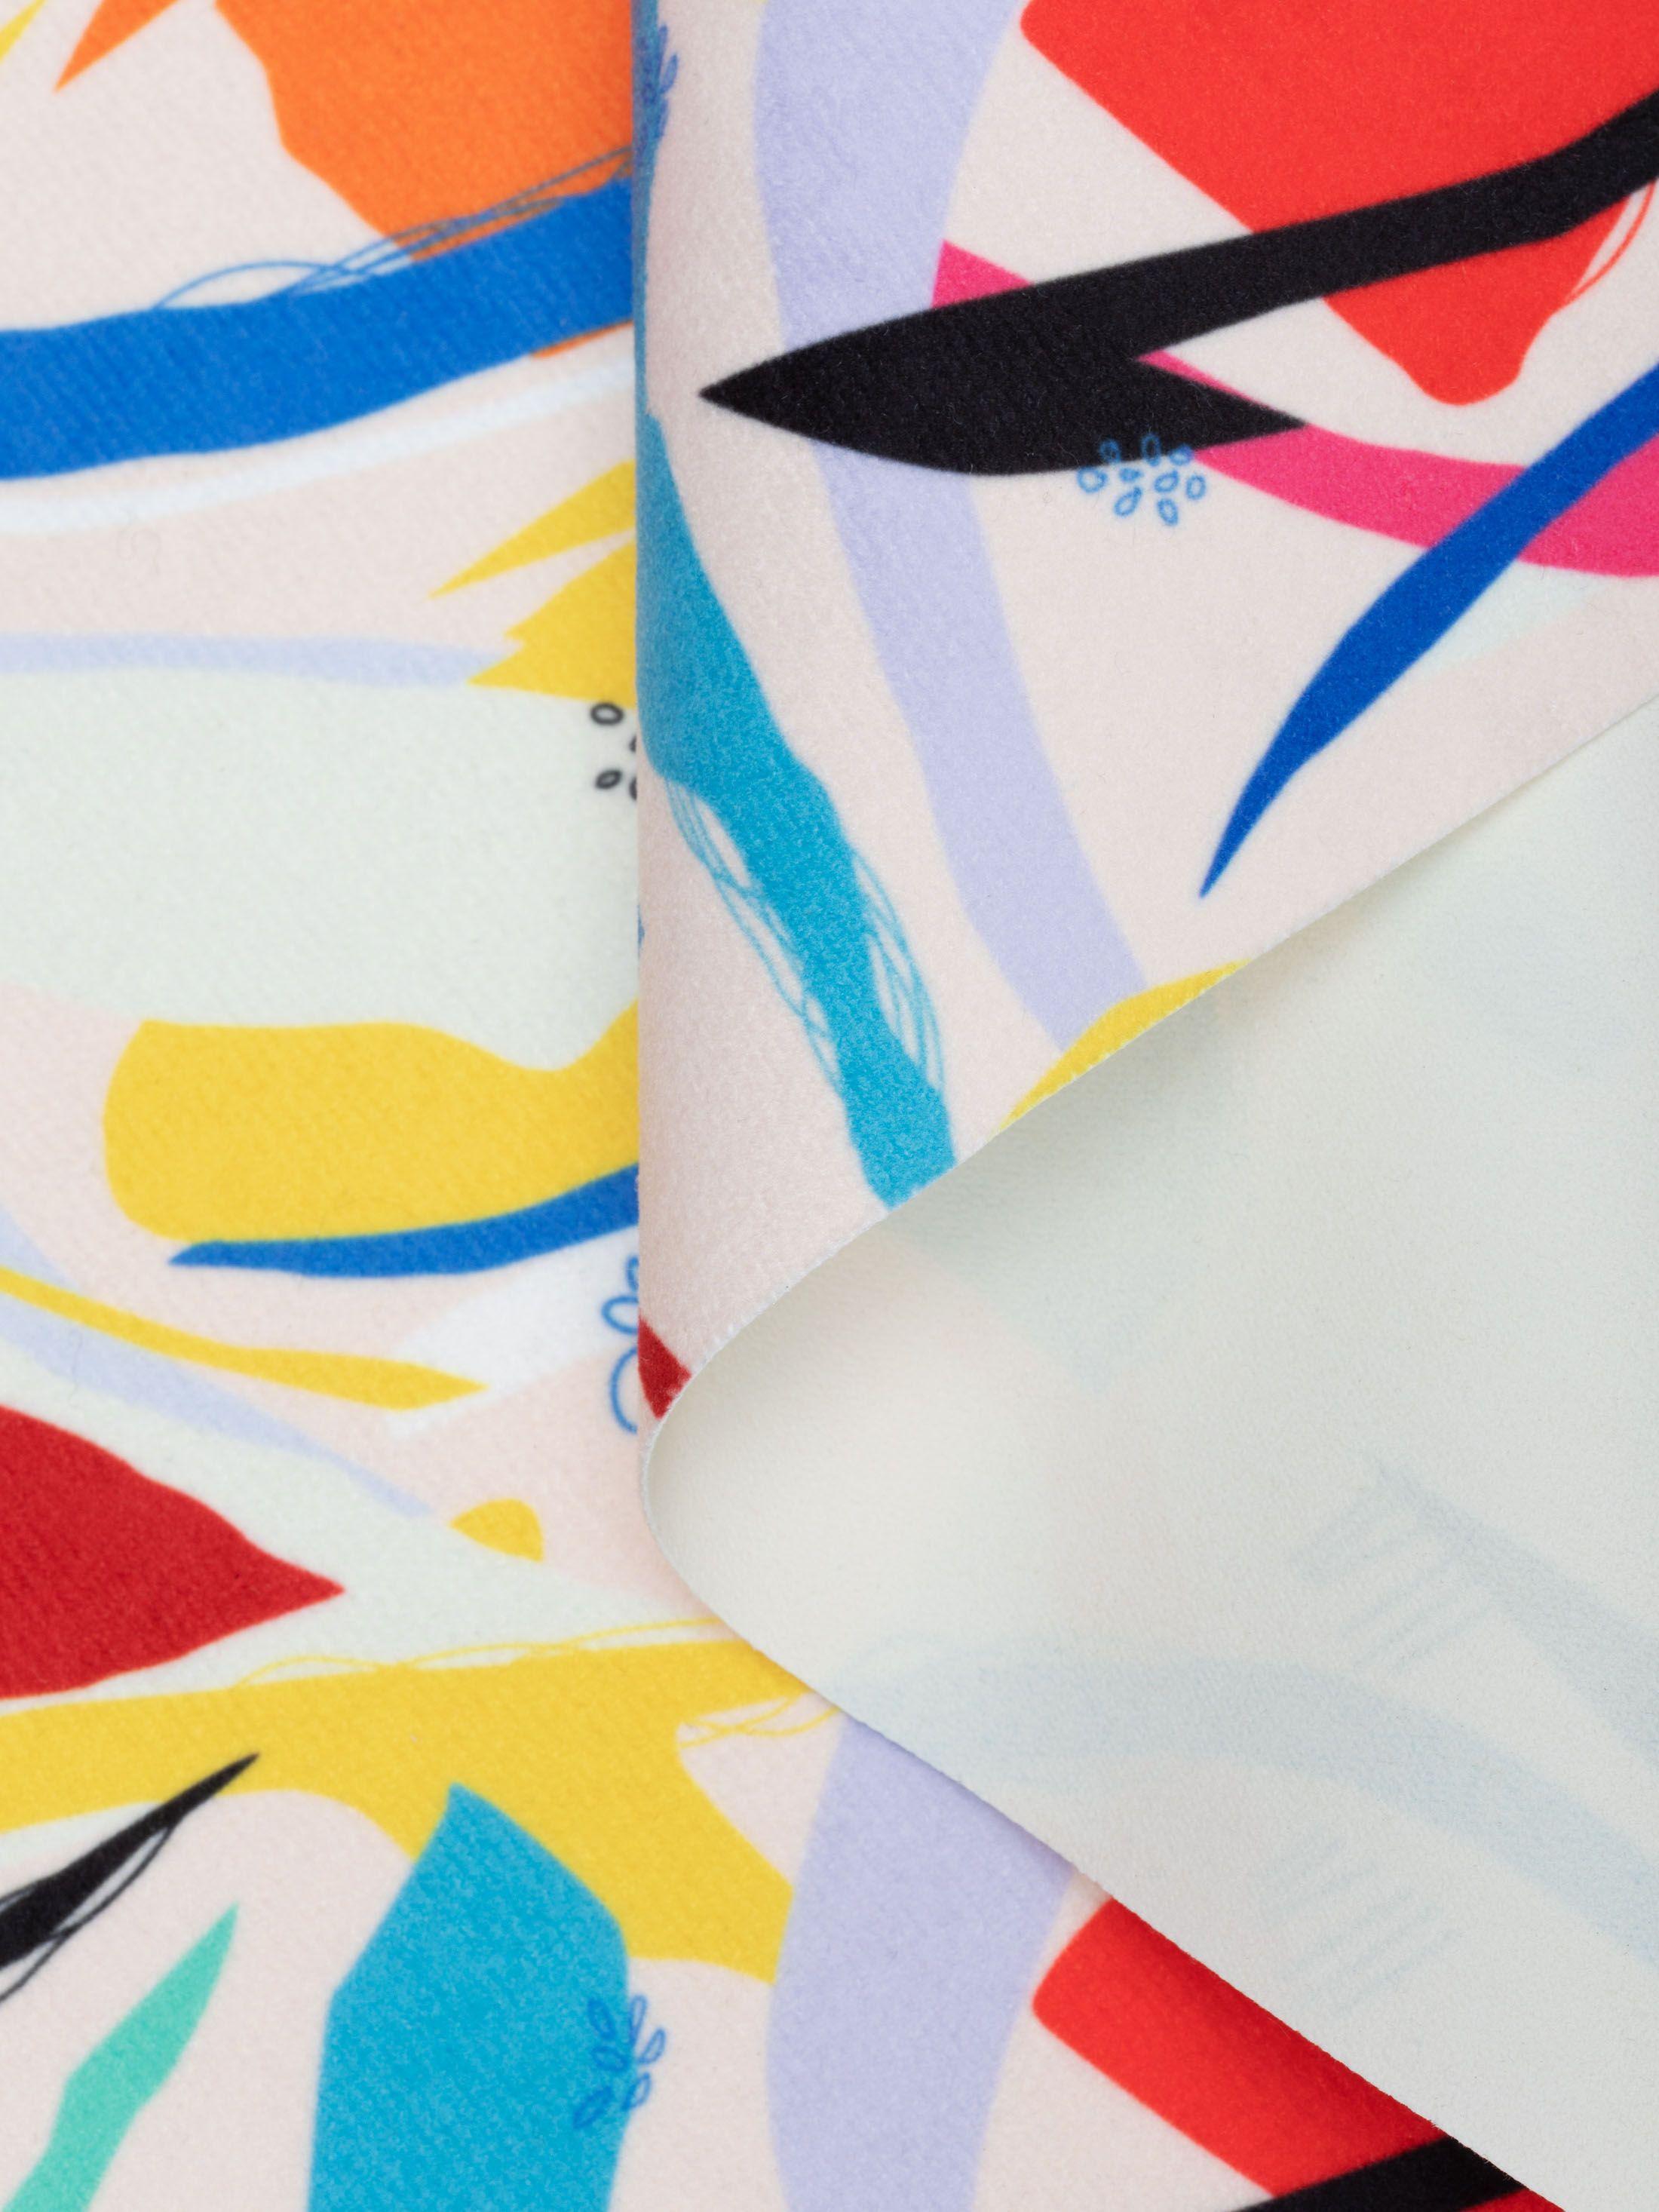 feuerresistenten Stoff bedrucken mit eigenem design